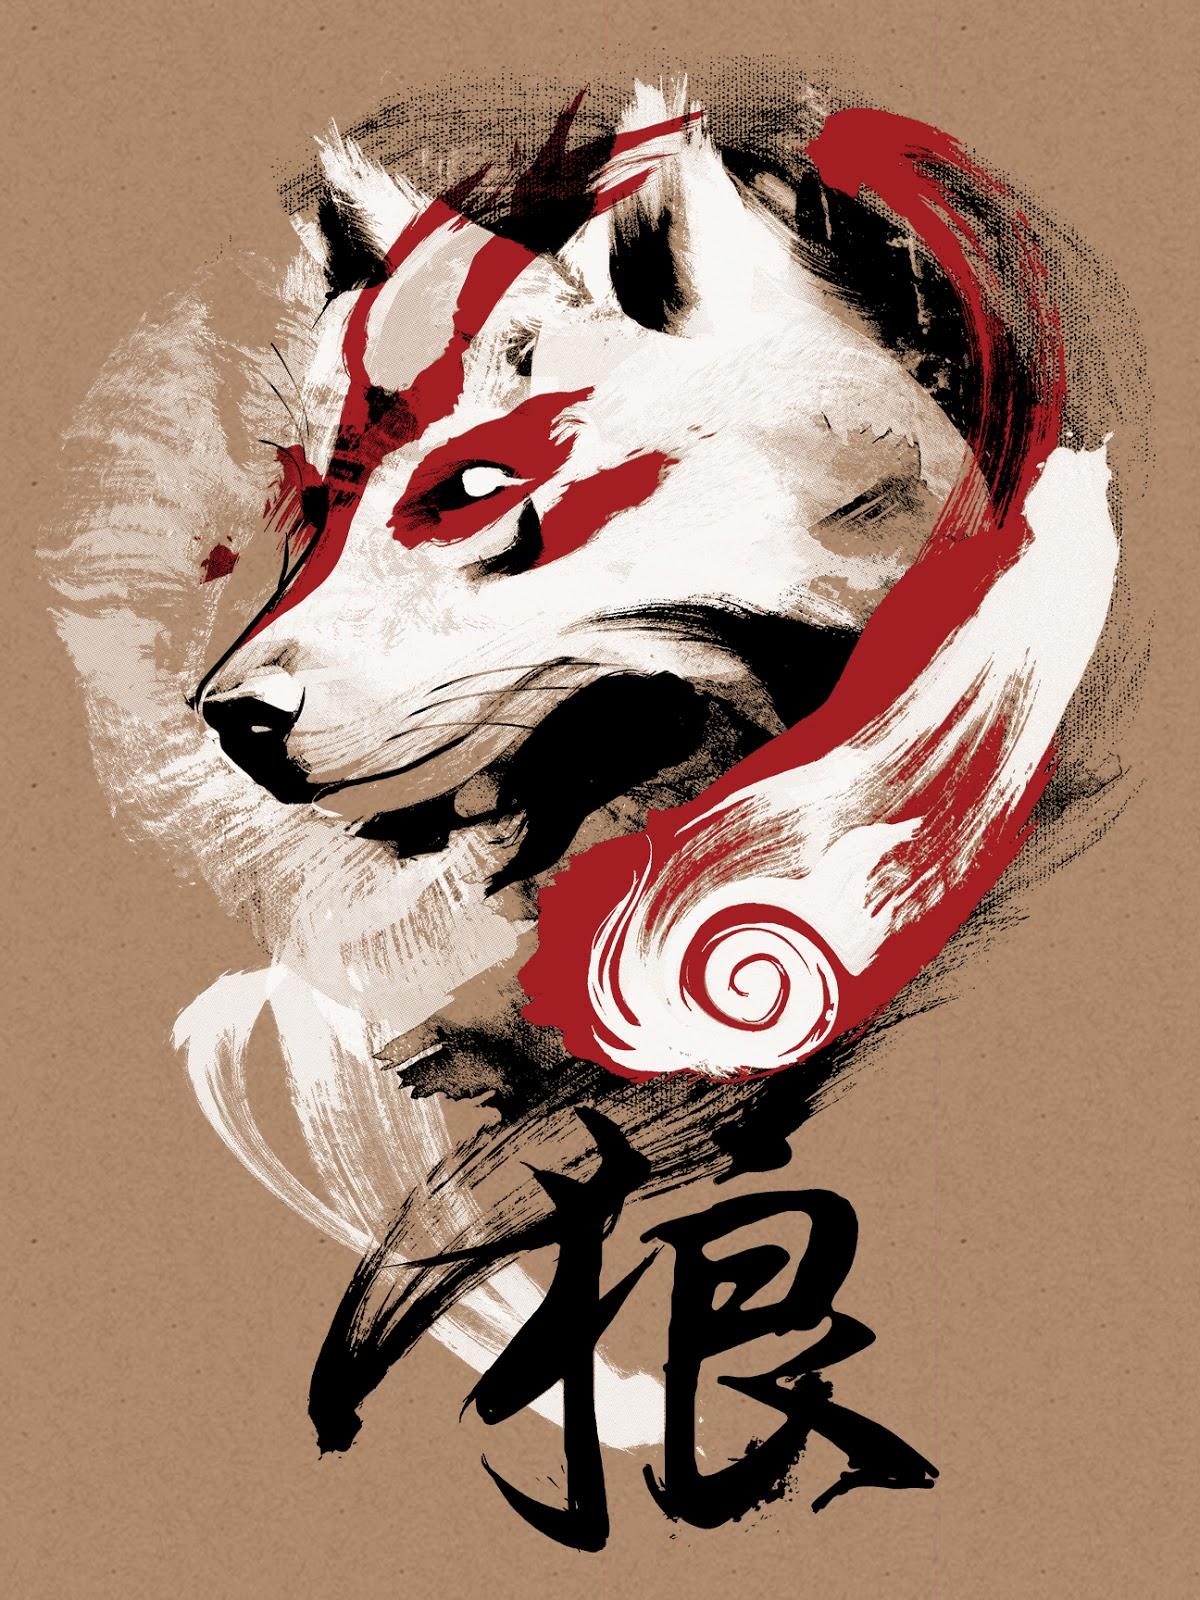 The geeky nerfherder cool art 39 wolf 39 by jimiyo for Cool art design ideas